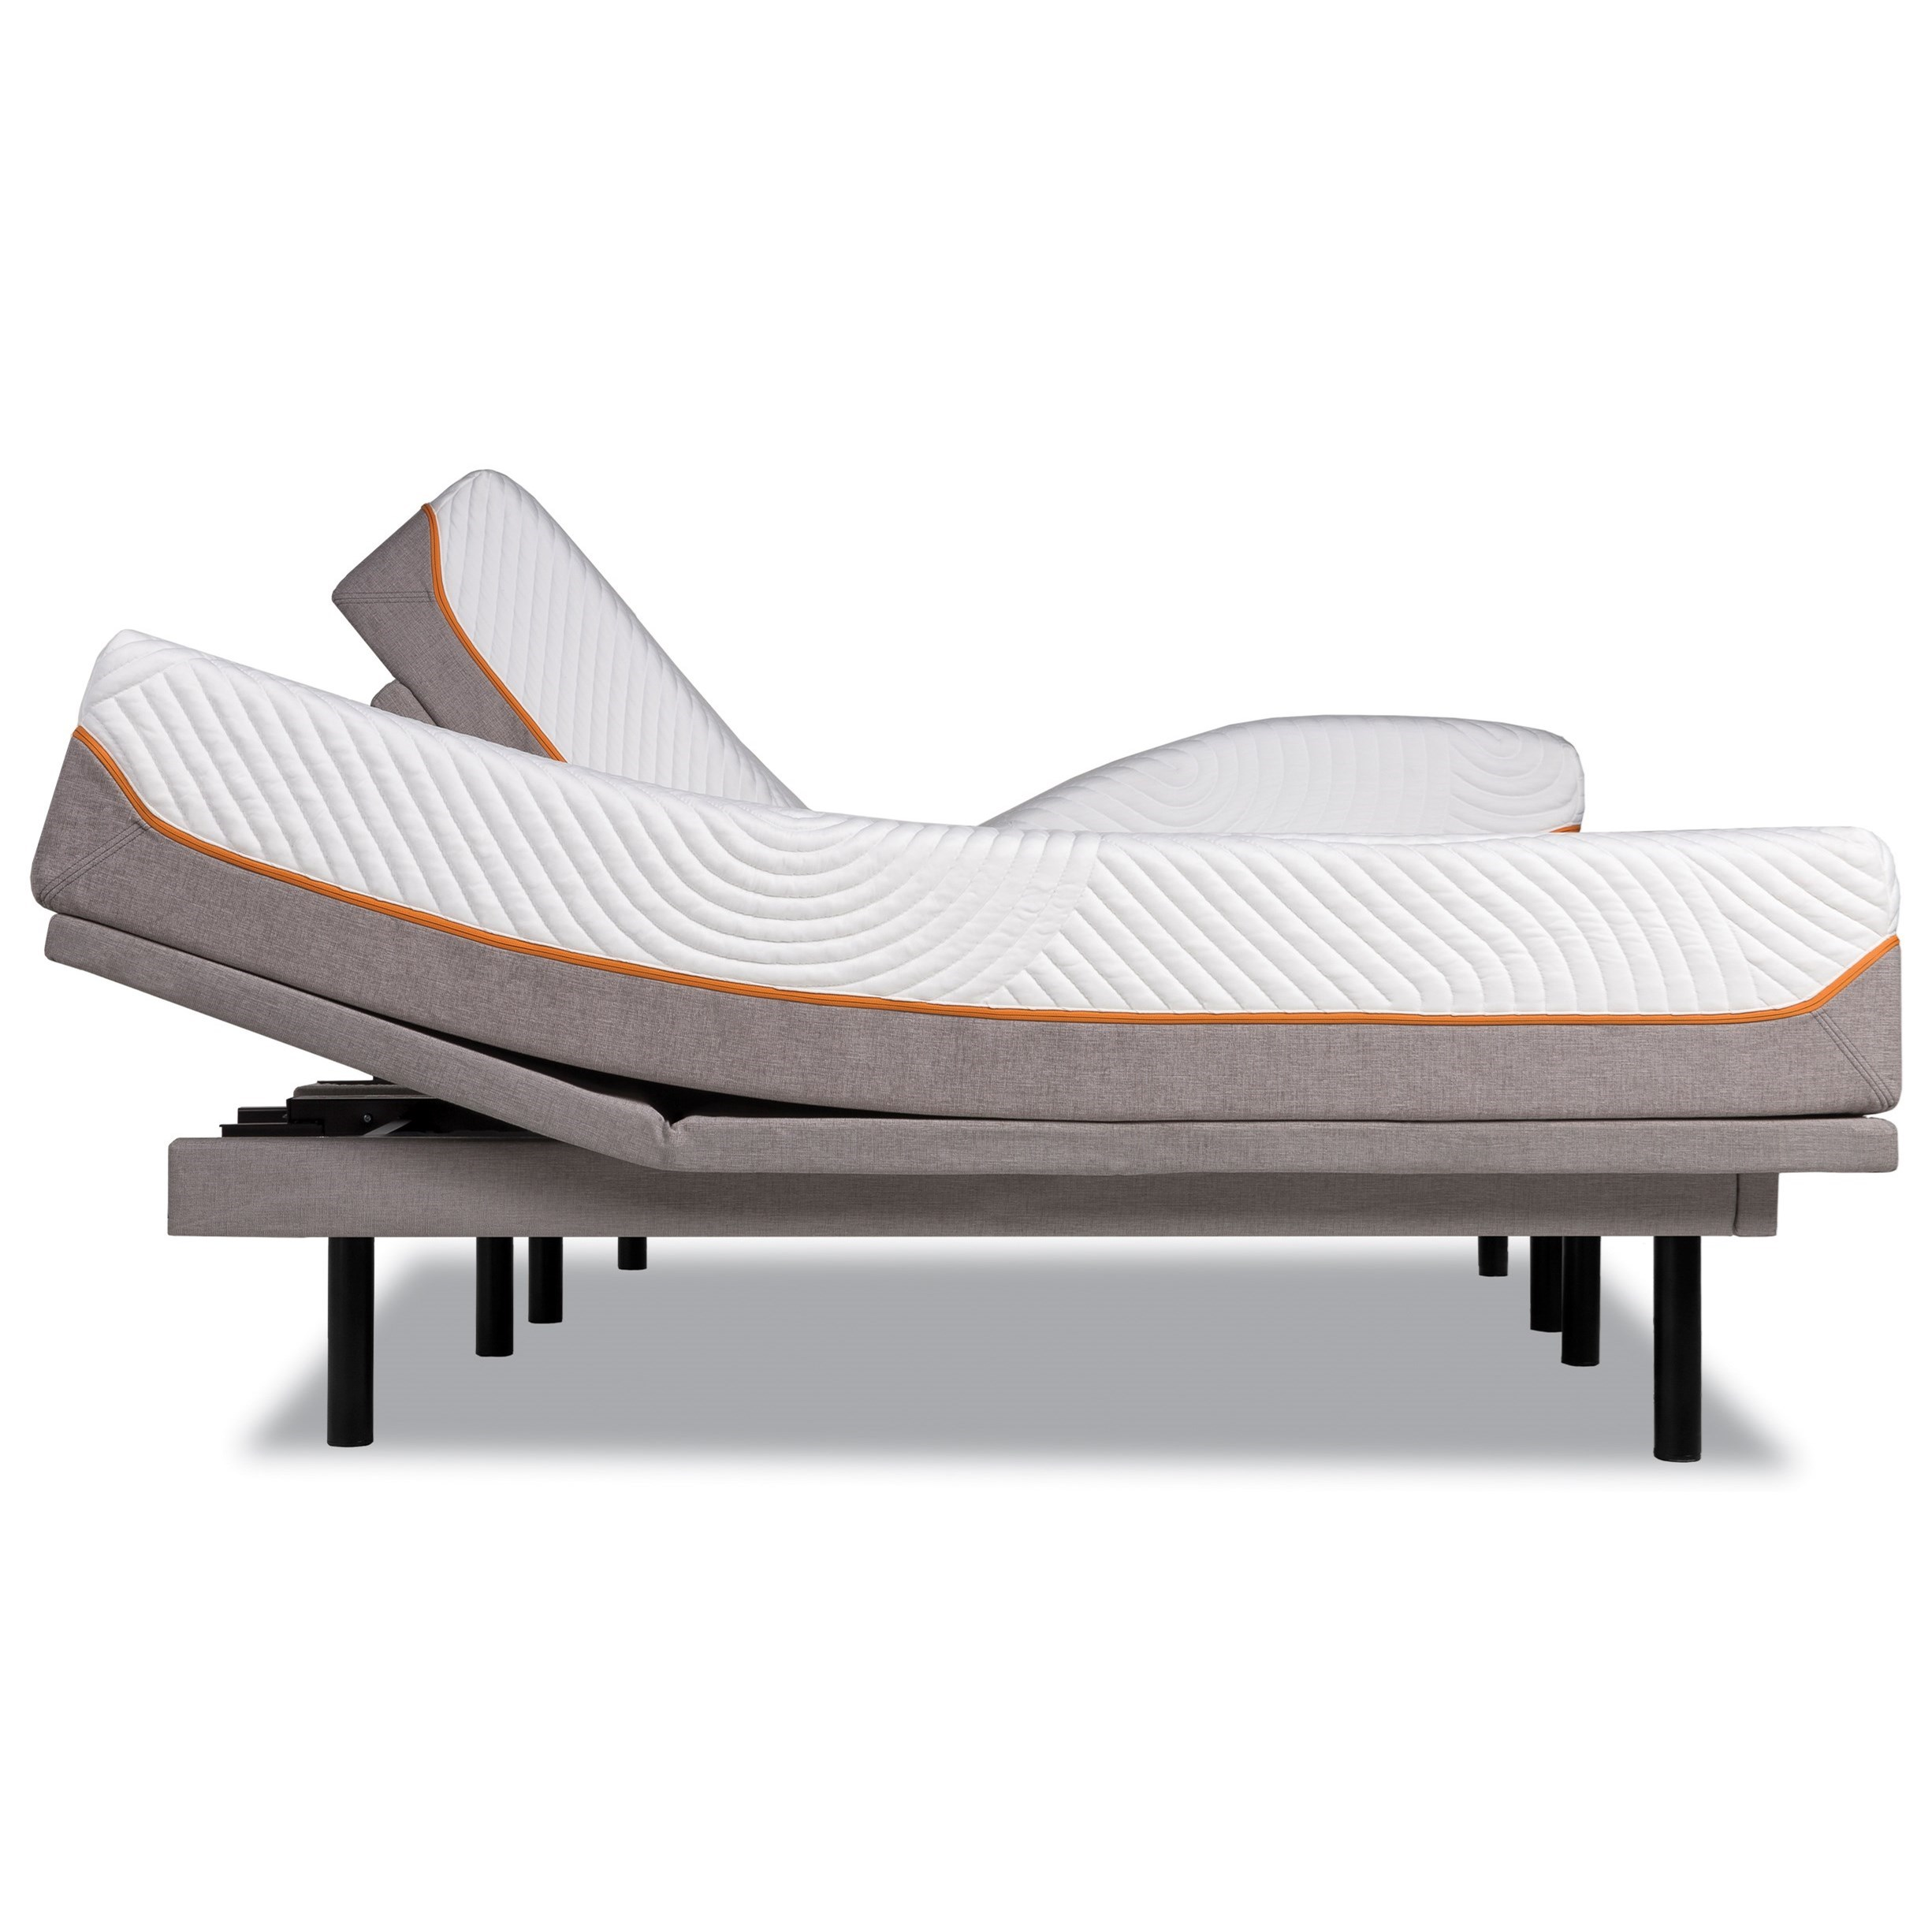 Tempur-Pedic® TEMPUR-Contour Supreme Full Firm Mattress Set - Item Number: 10256130+25289230